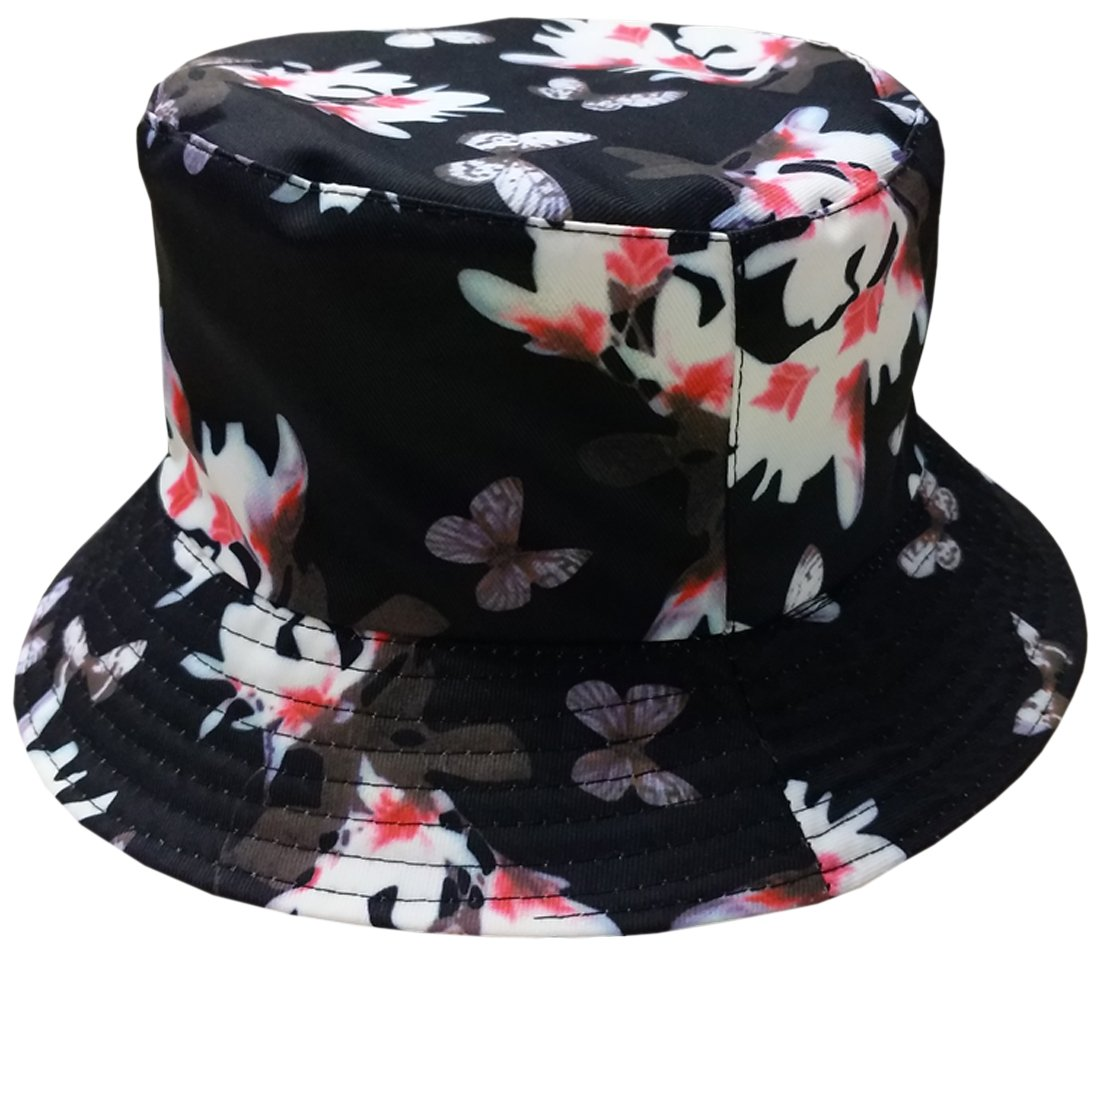 038e2e9f81cf8f ACVIP Women's Print Packable Fisherman Bucket Hat Summer Sun Protection Cap  AWYB74